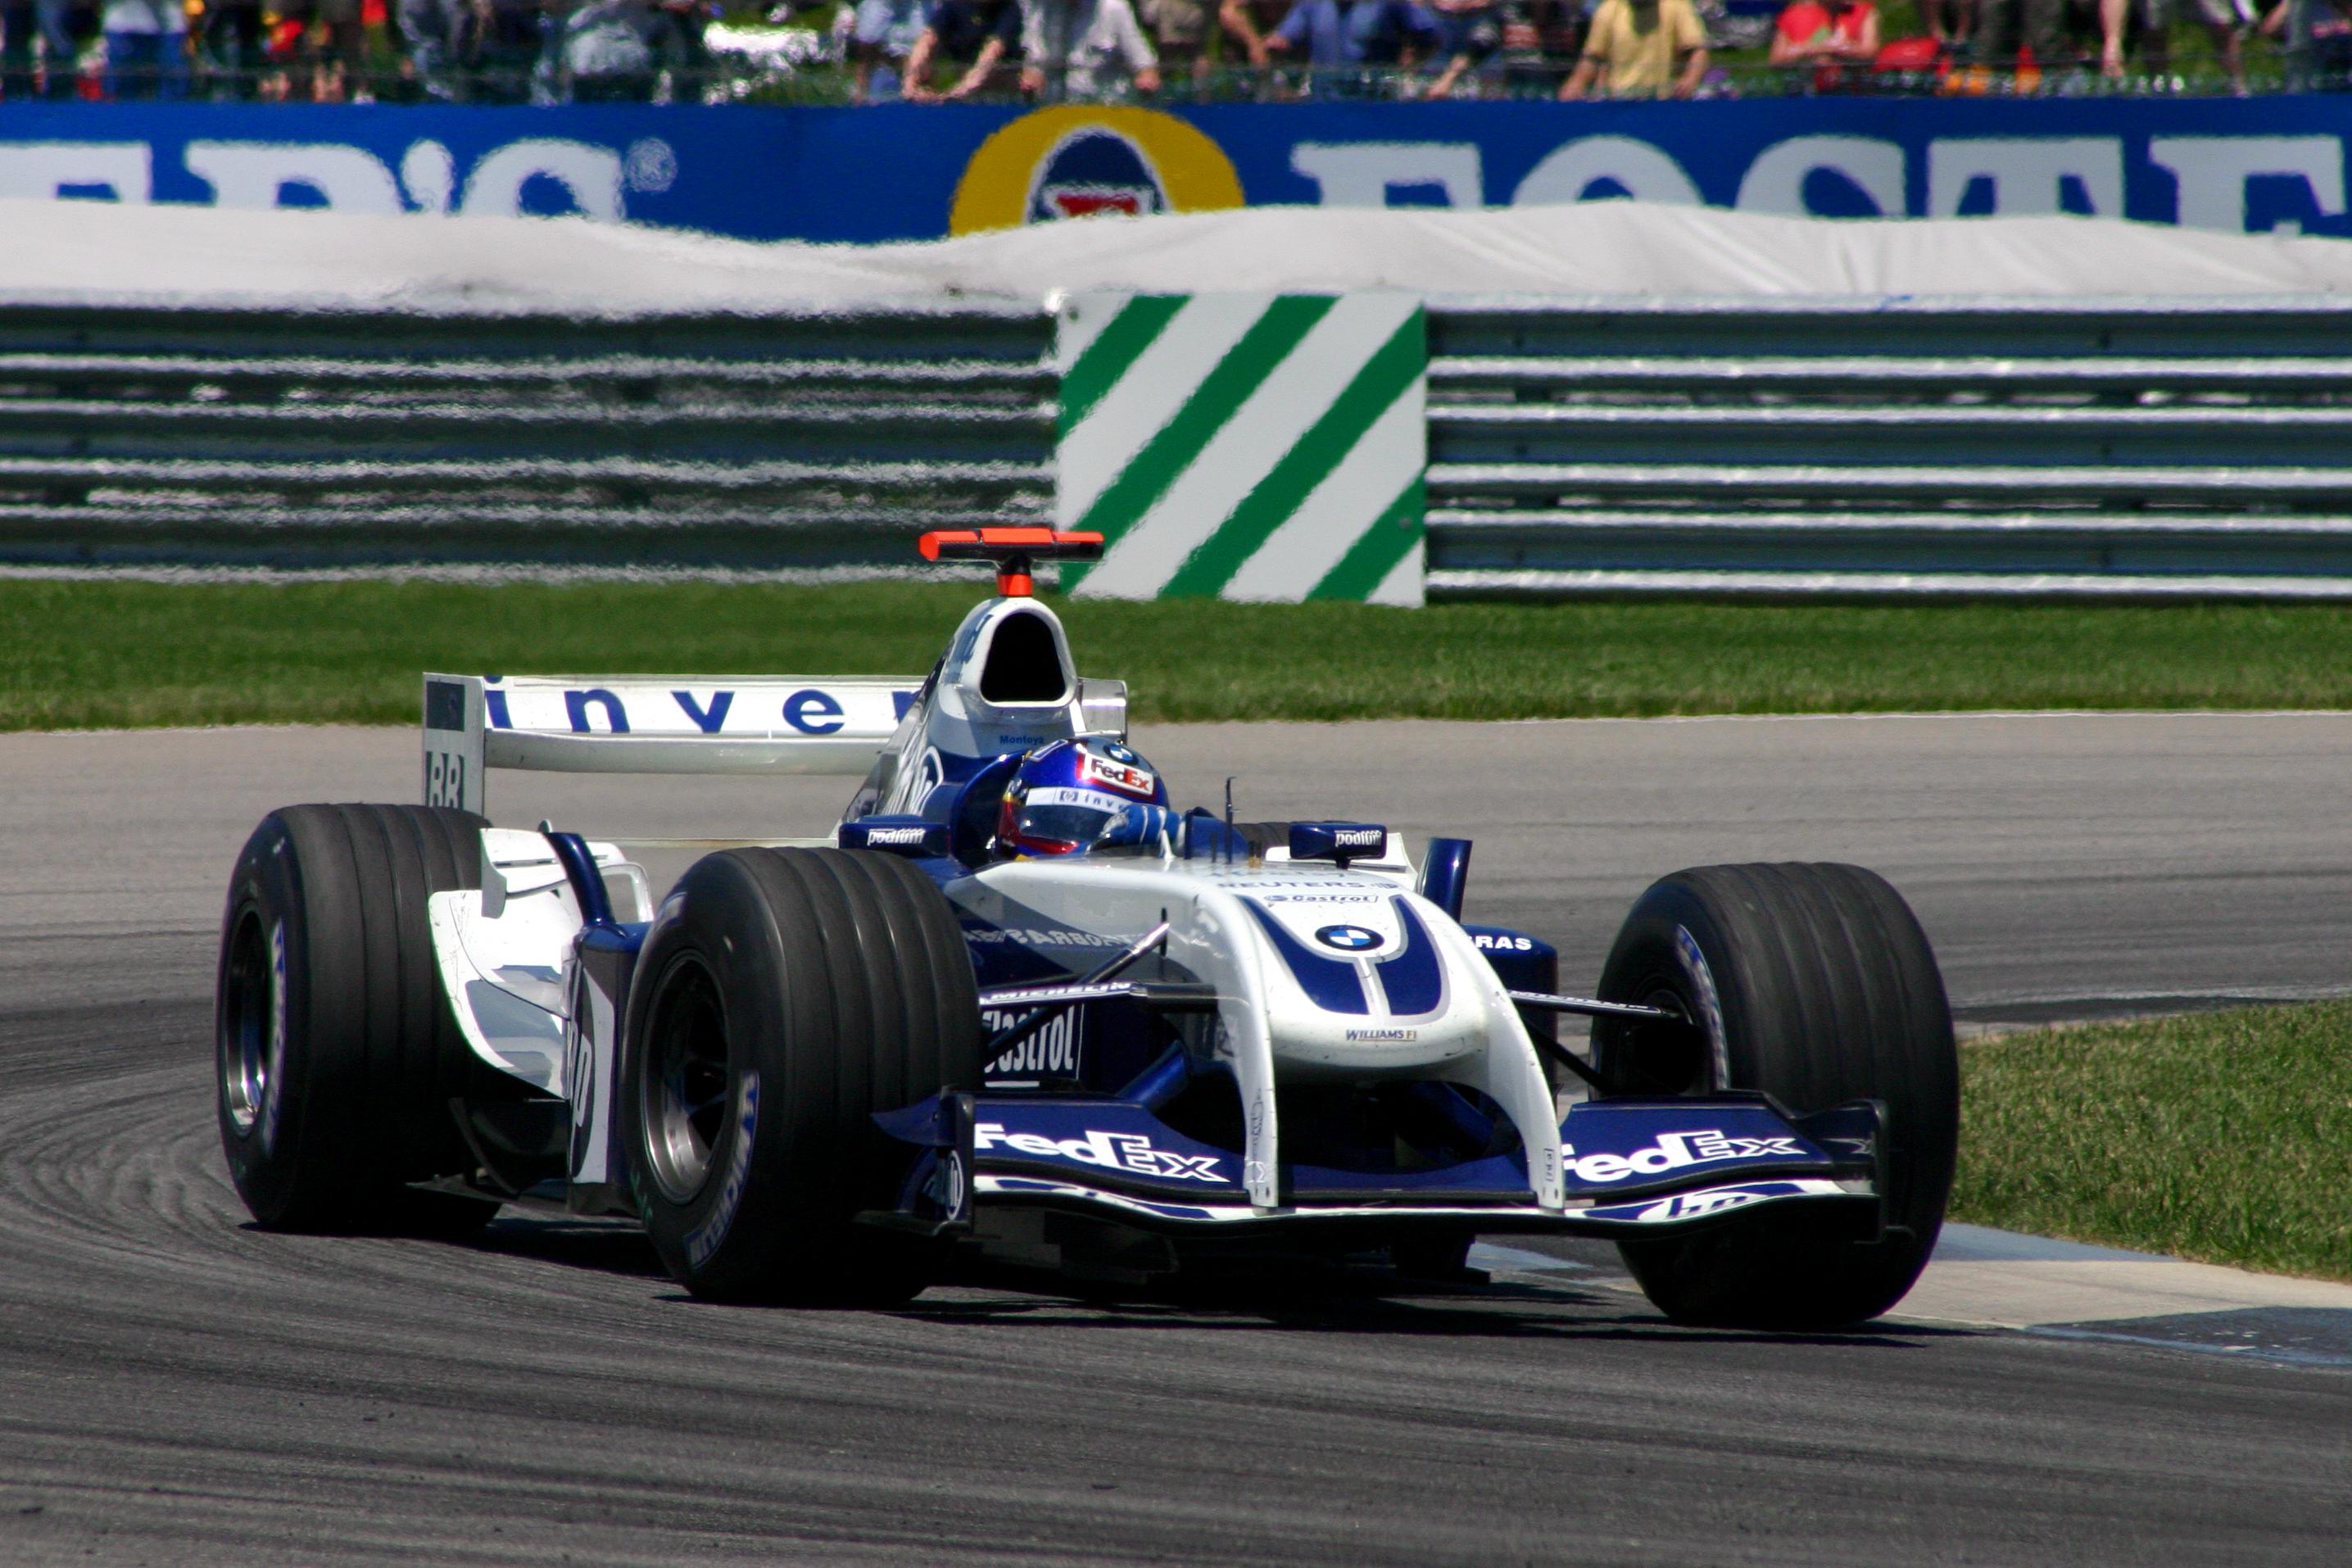 Juan Pablo Montoya manejando el [[Williams FW26